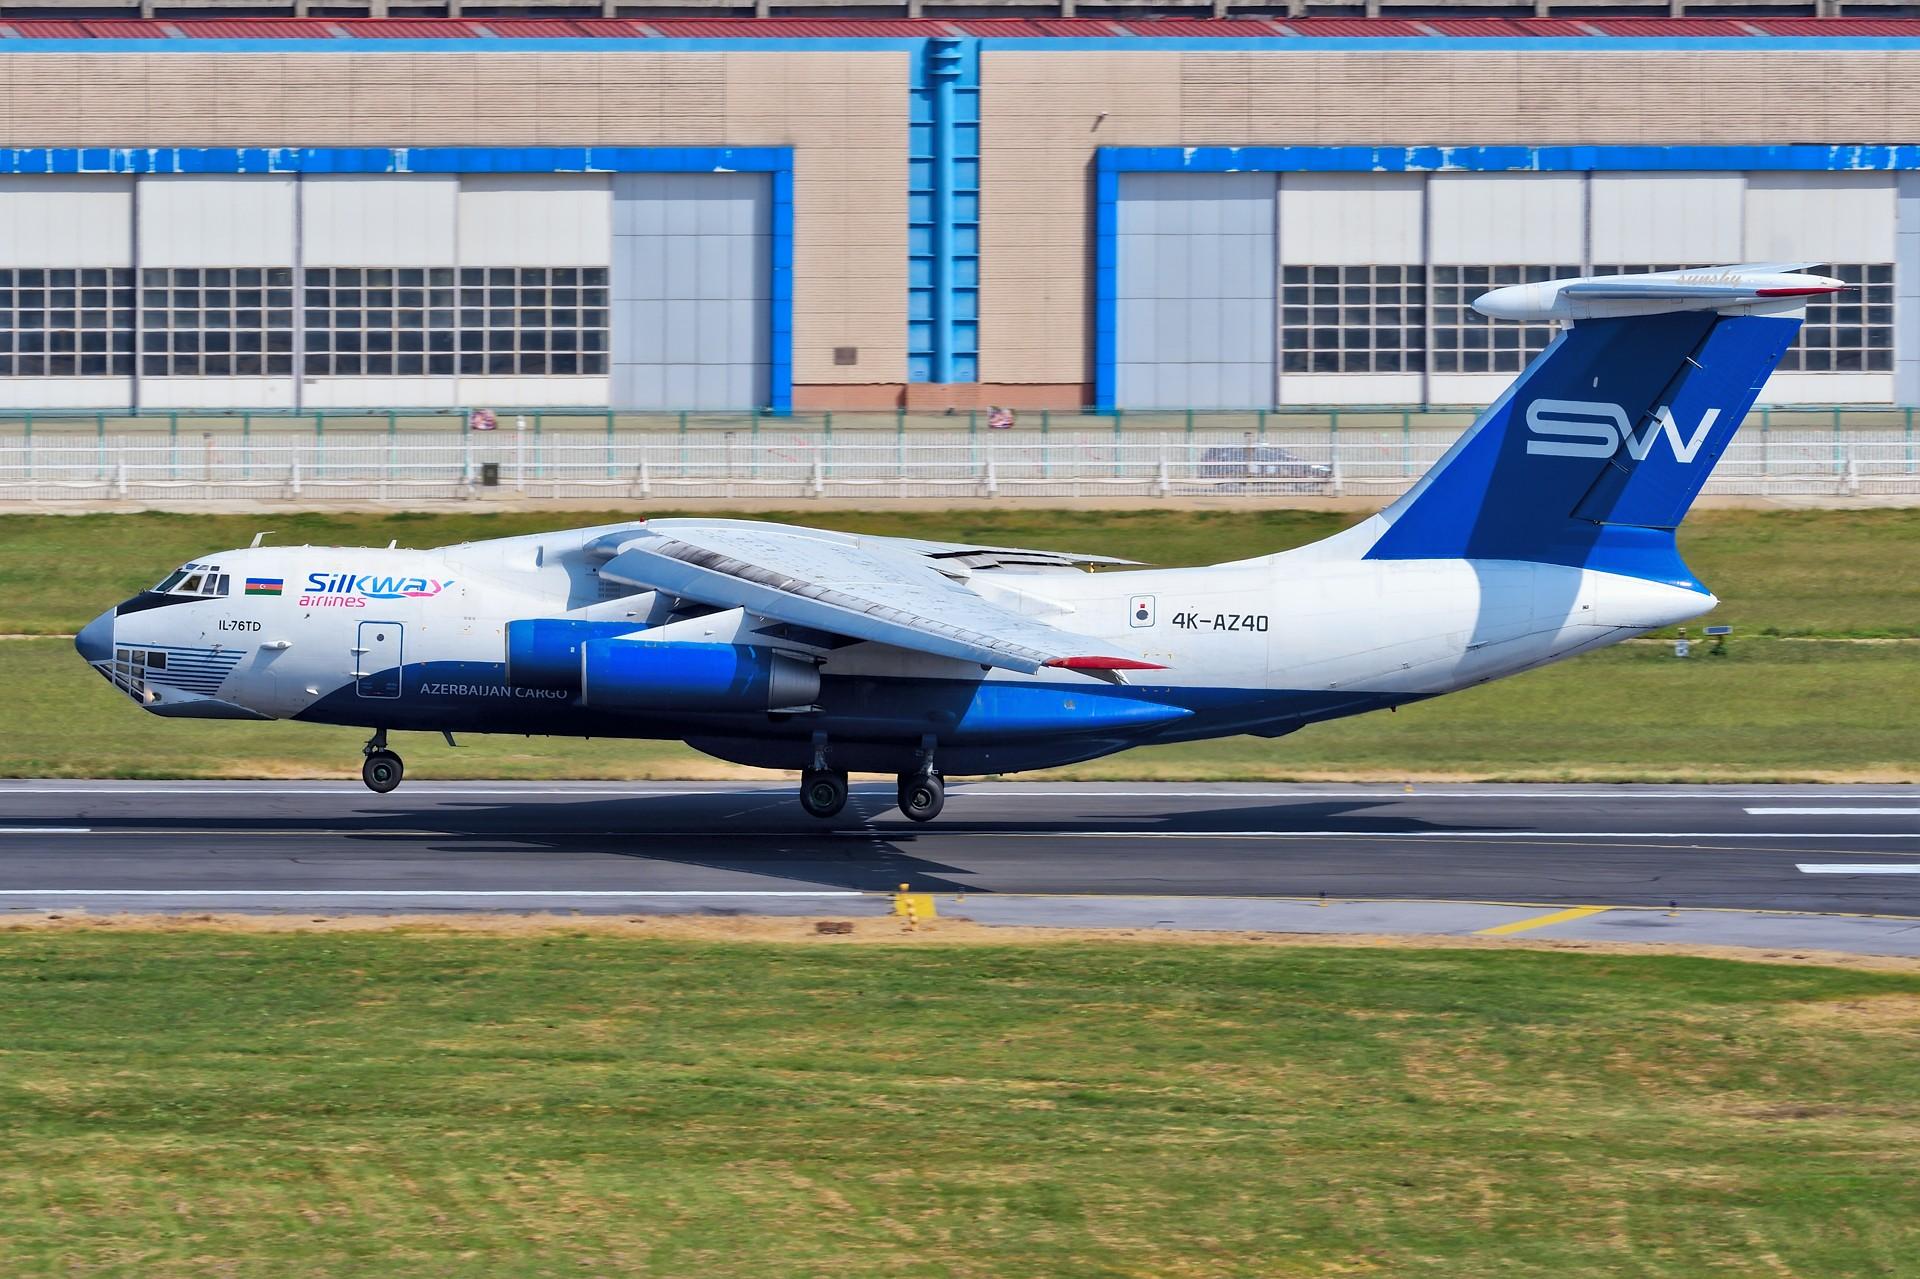 Re:[原创]★[DLC]一点有趣的事情(持续更新中)★ ILYUSHIN IL-76-TD 4K-AZ40 中国大连国际机场